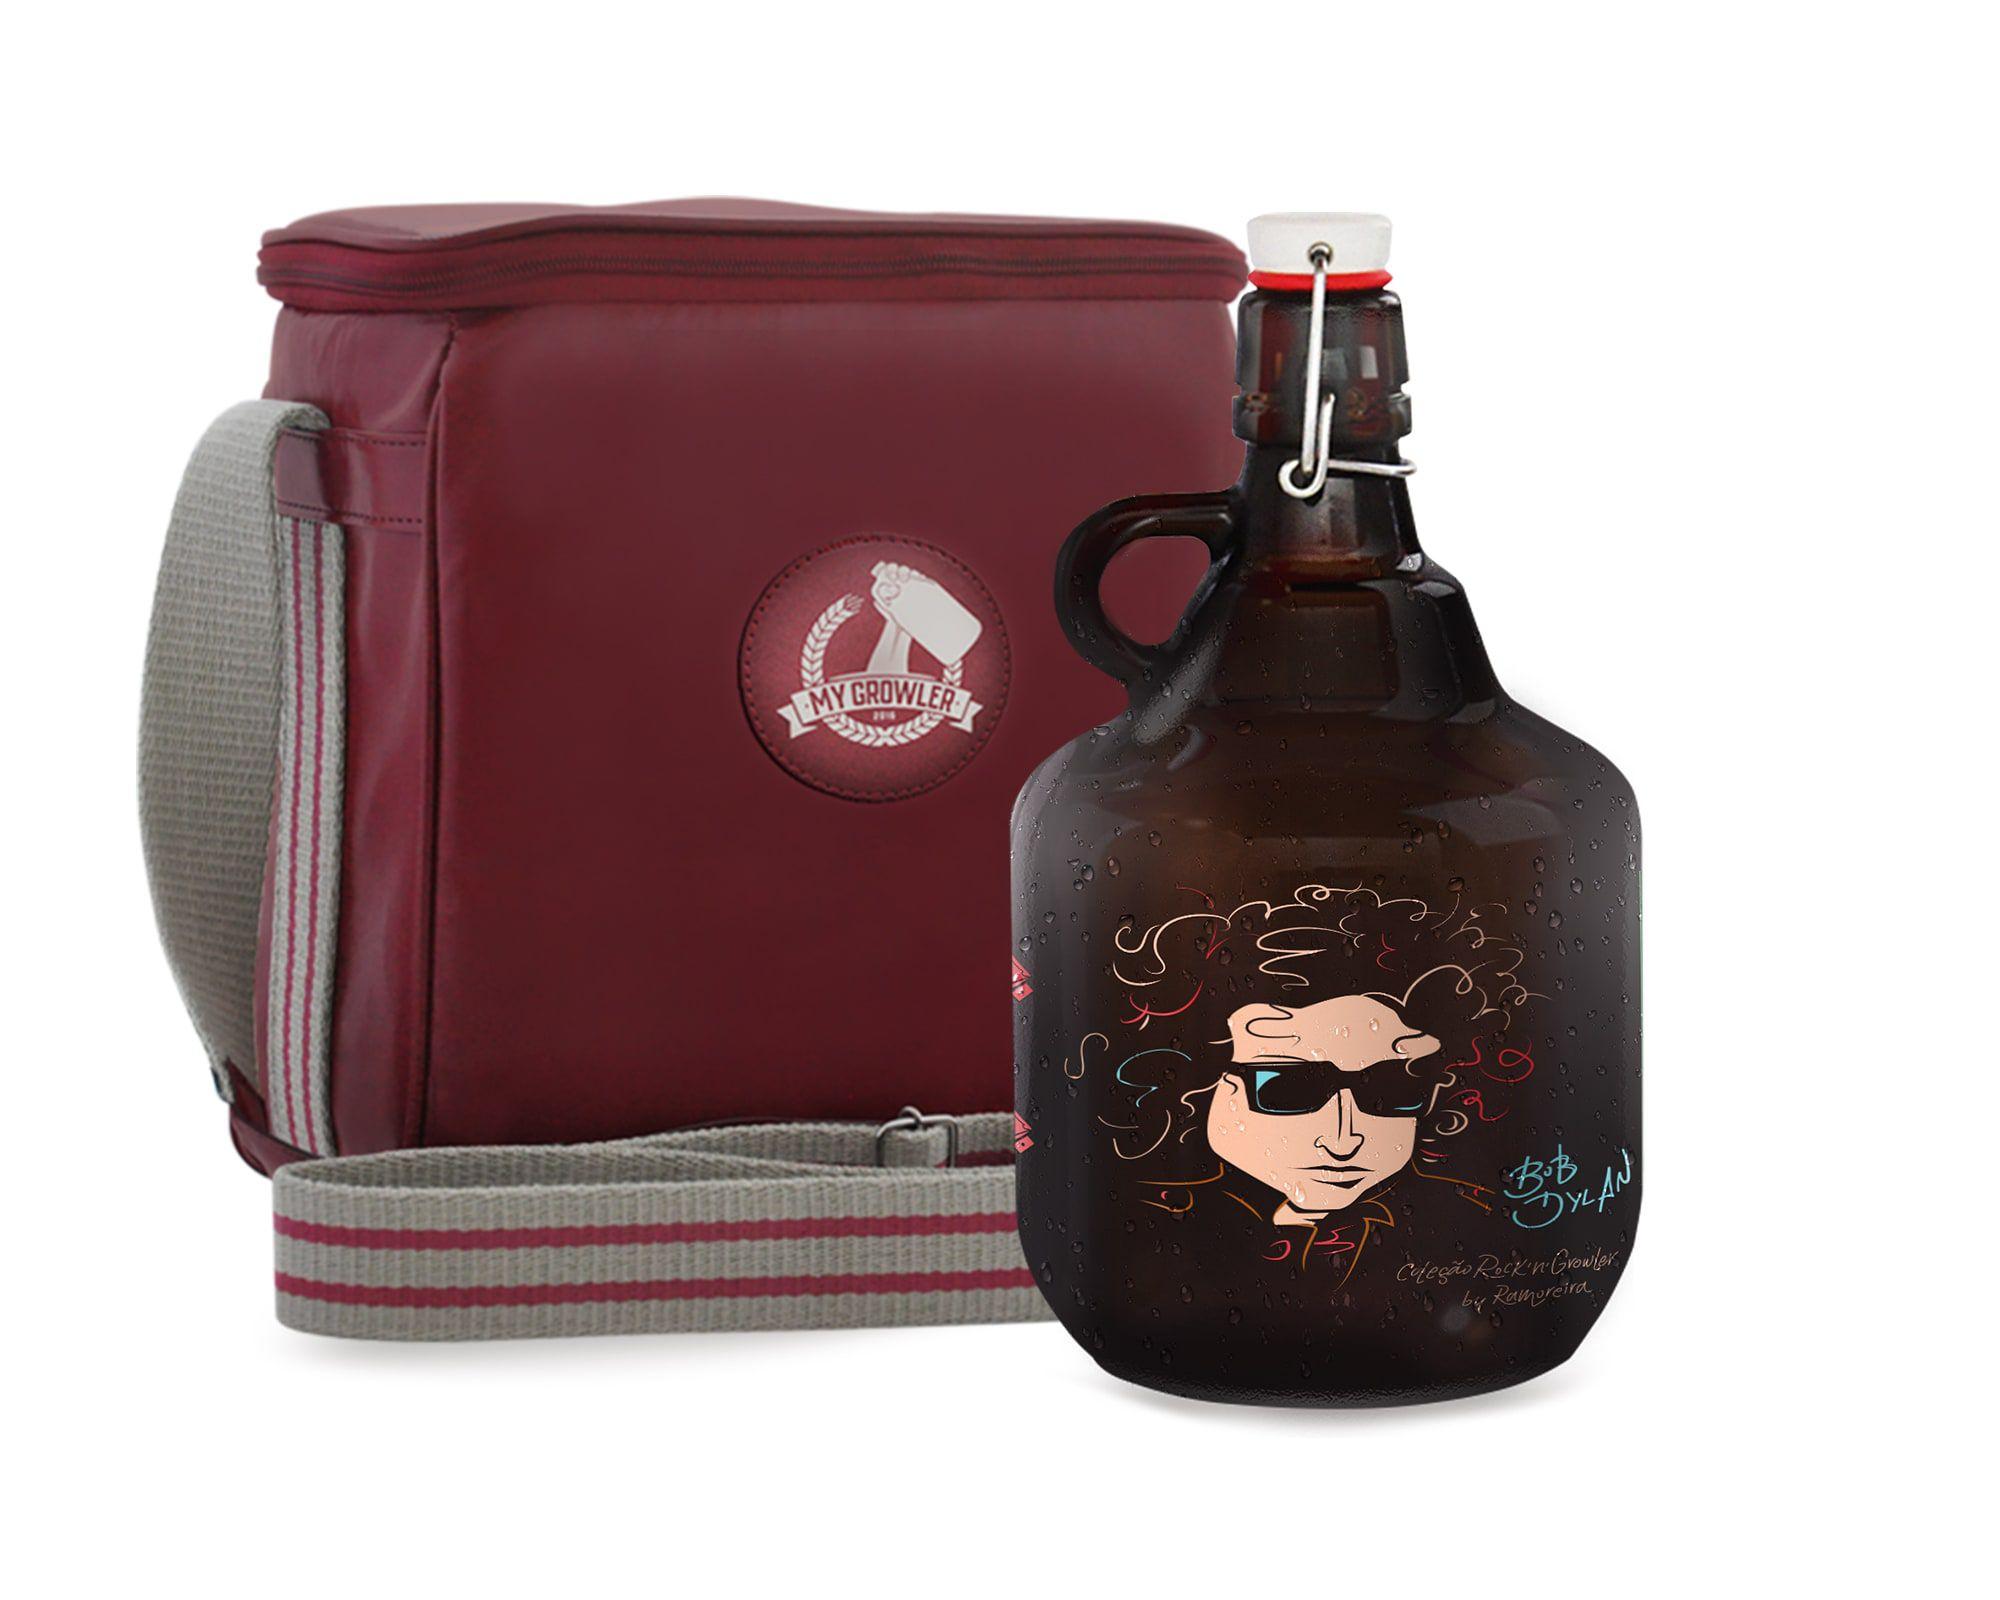 KIT TRAVEL #1: Grand Growler 2l Bob Dylan + Growler Bag Travel 2 growlers Vermelho